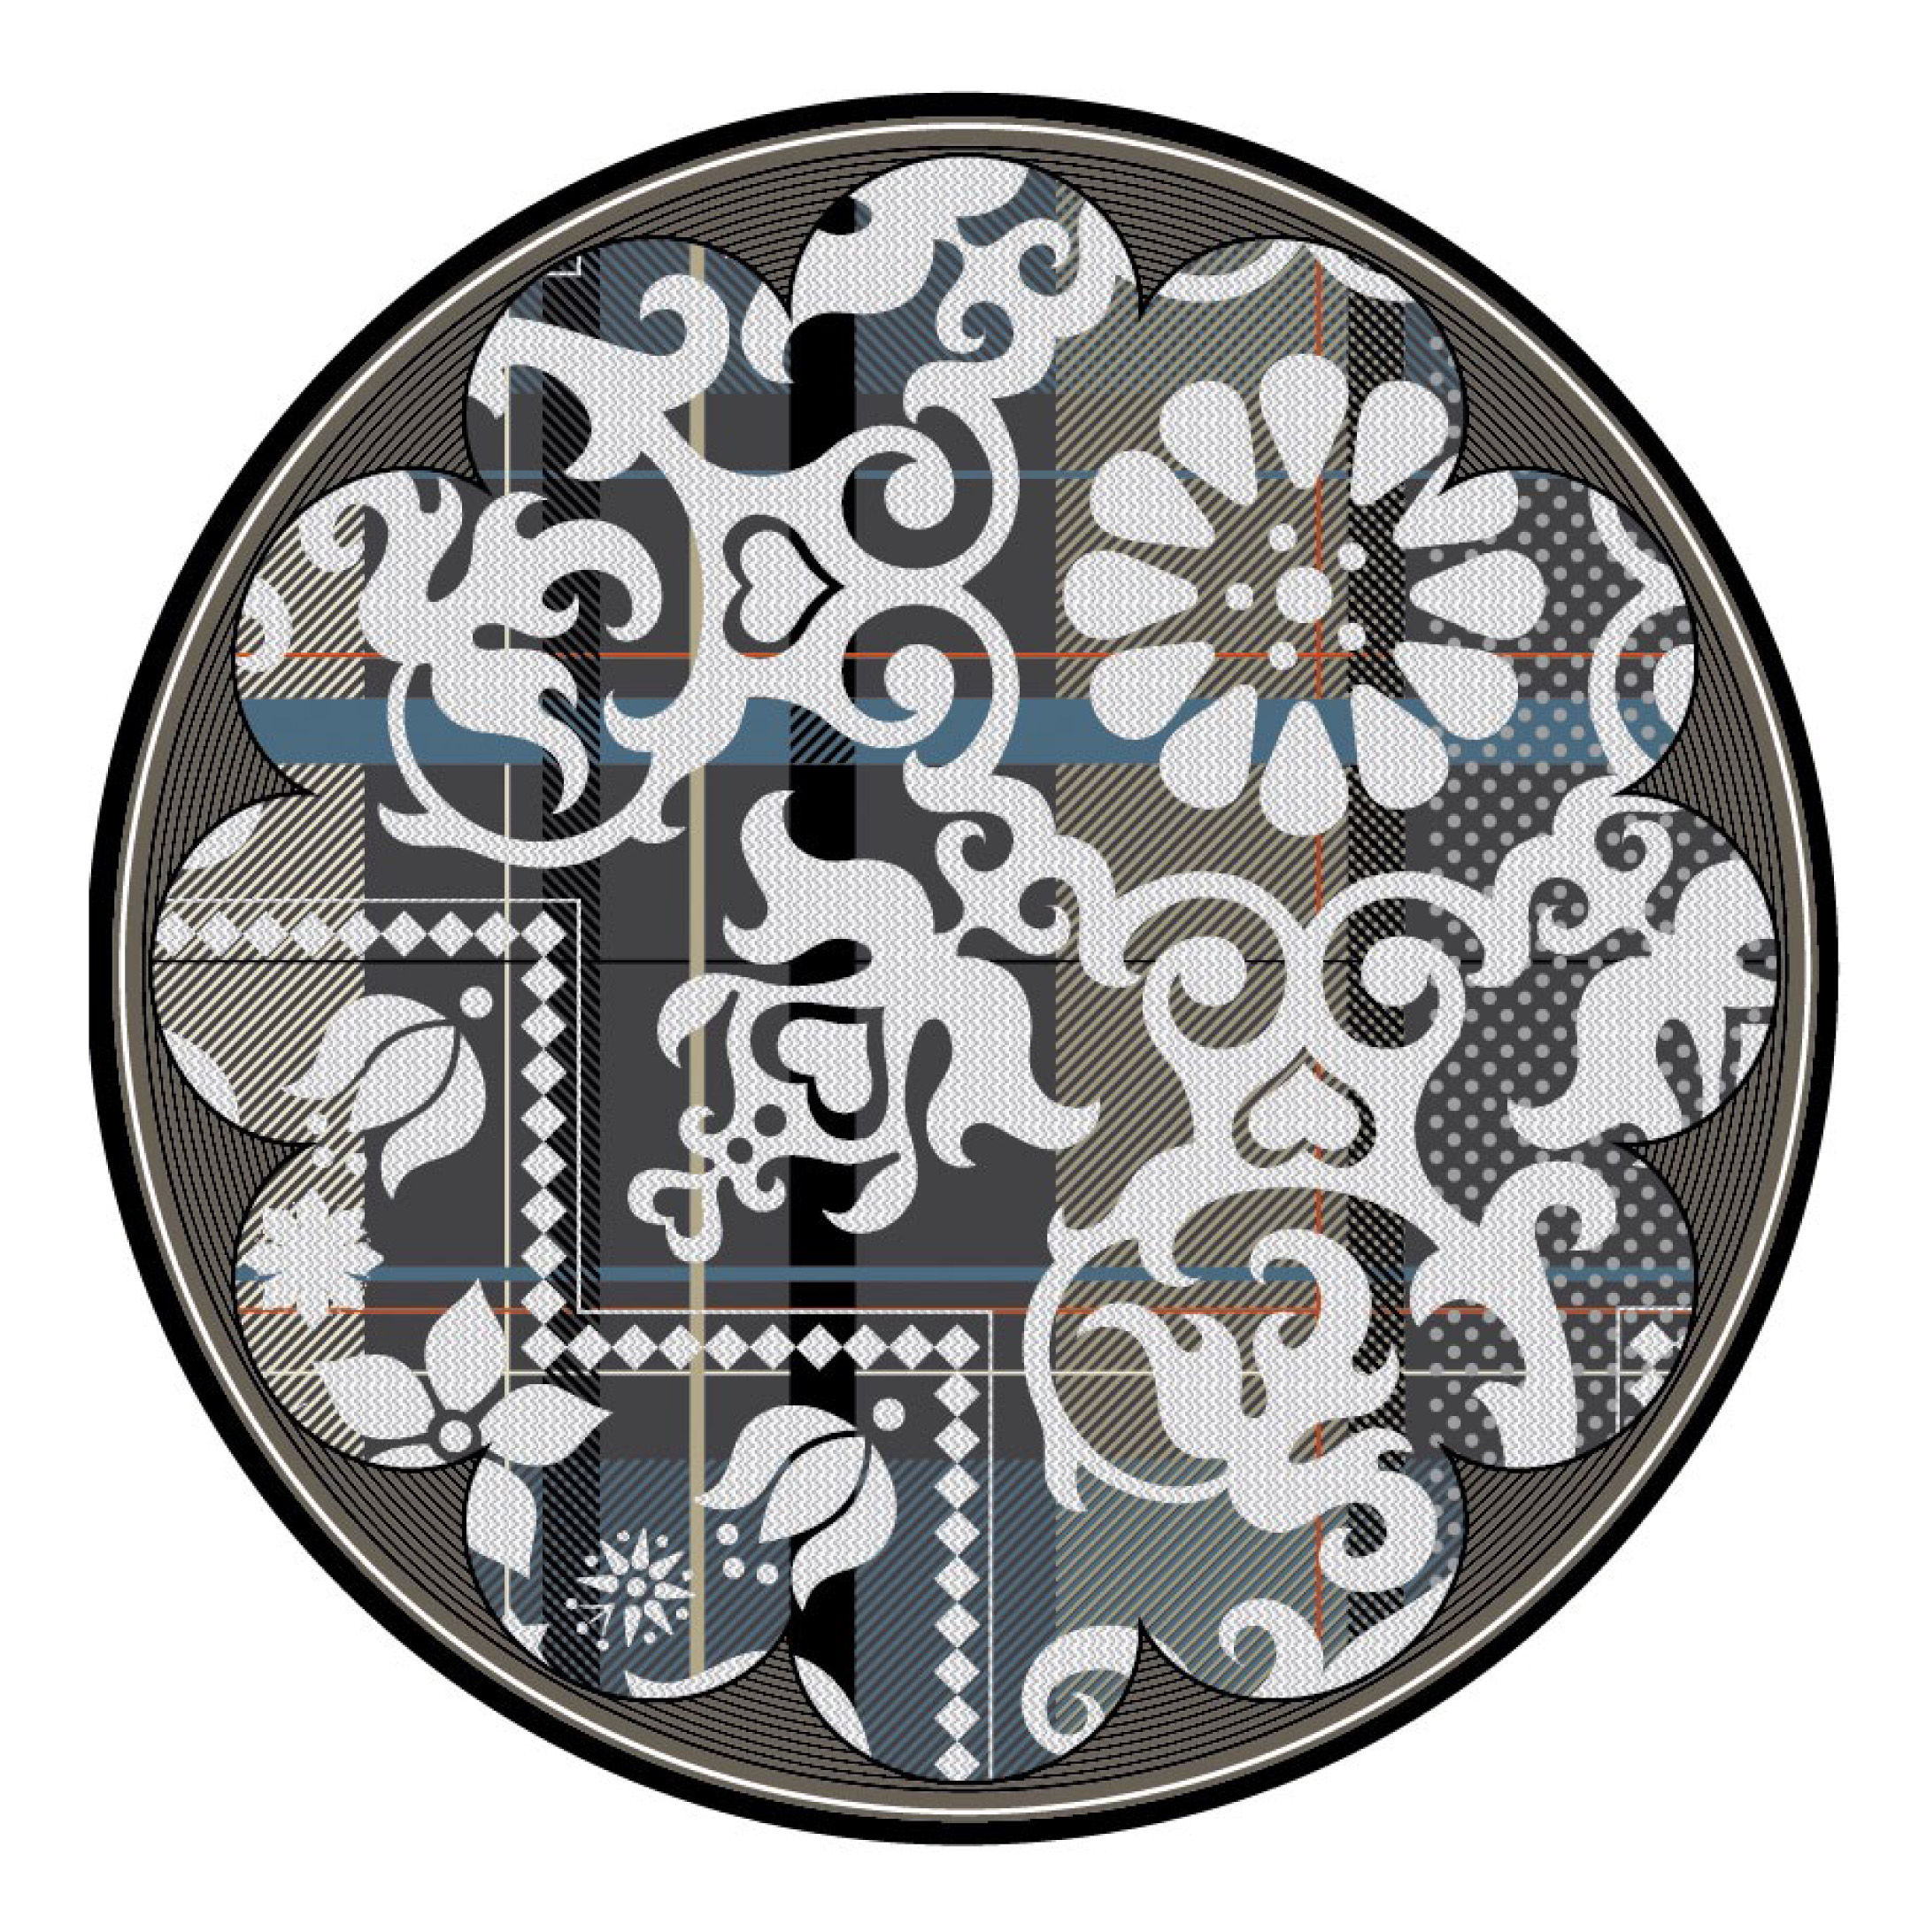 tapis fata morgana tj two rond 350 cm multicolore moooi. Black Bedroom Furniture Sets. Home Design Ideas